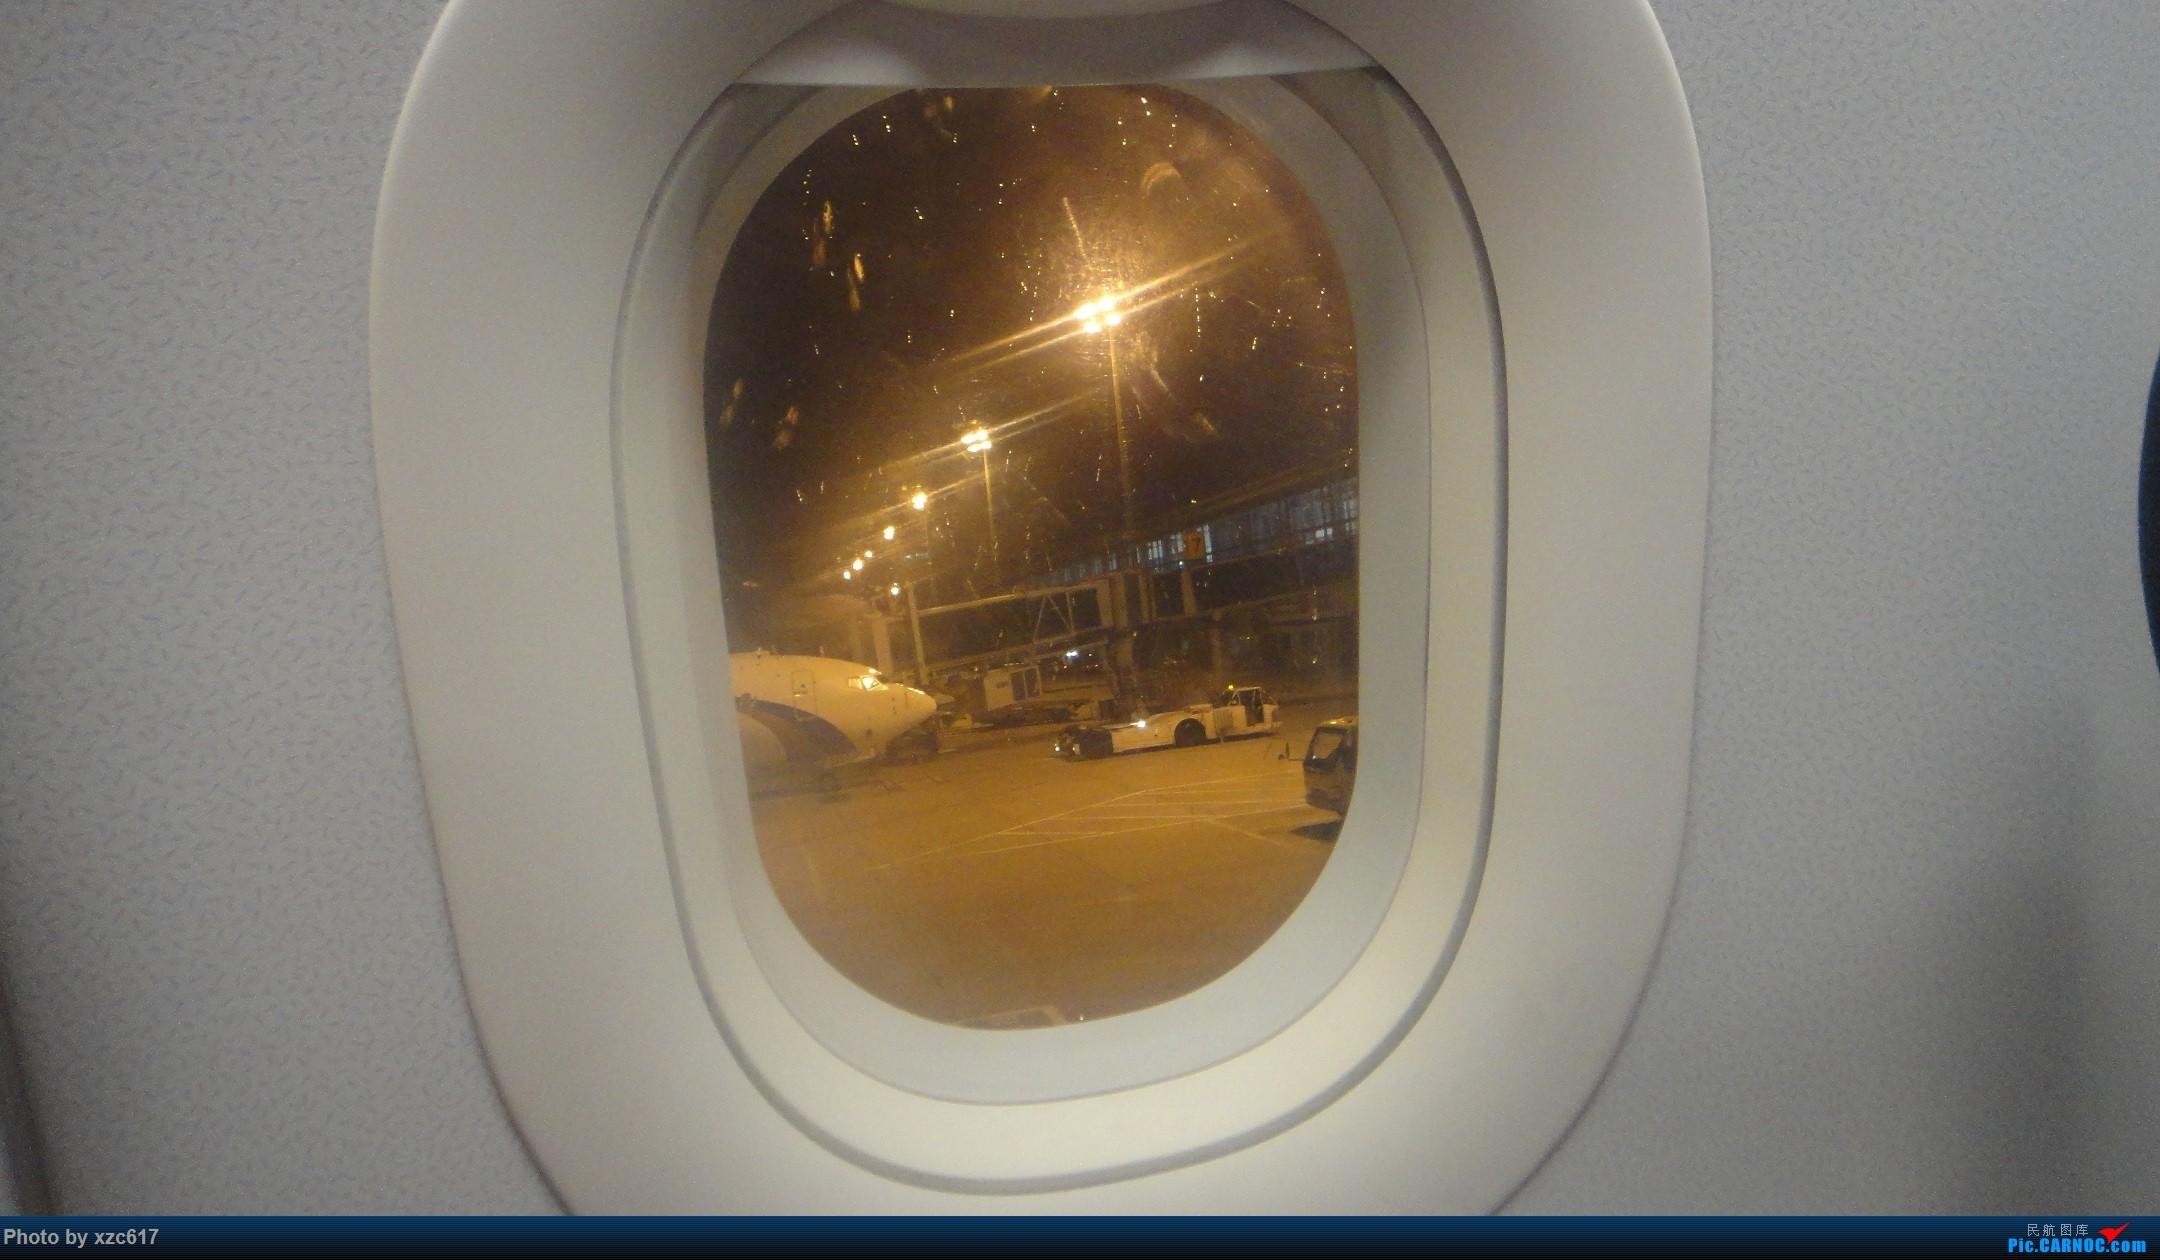 Re:[原创][xzc617的飞行游记 NO.1] 由扬州到大连,平生第一次游海岛 AIRBUS A320-200 B-6736 中国大连国际机场